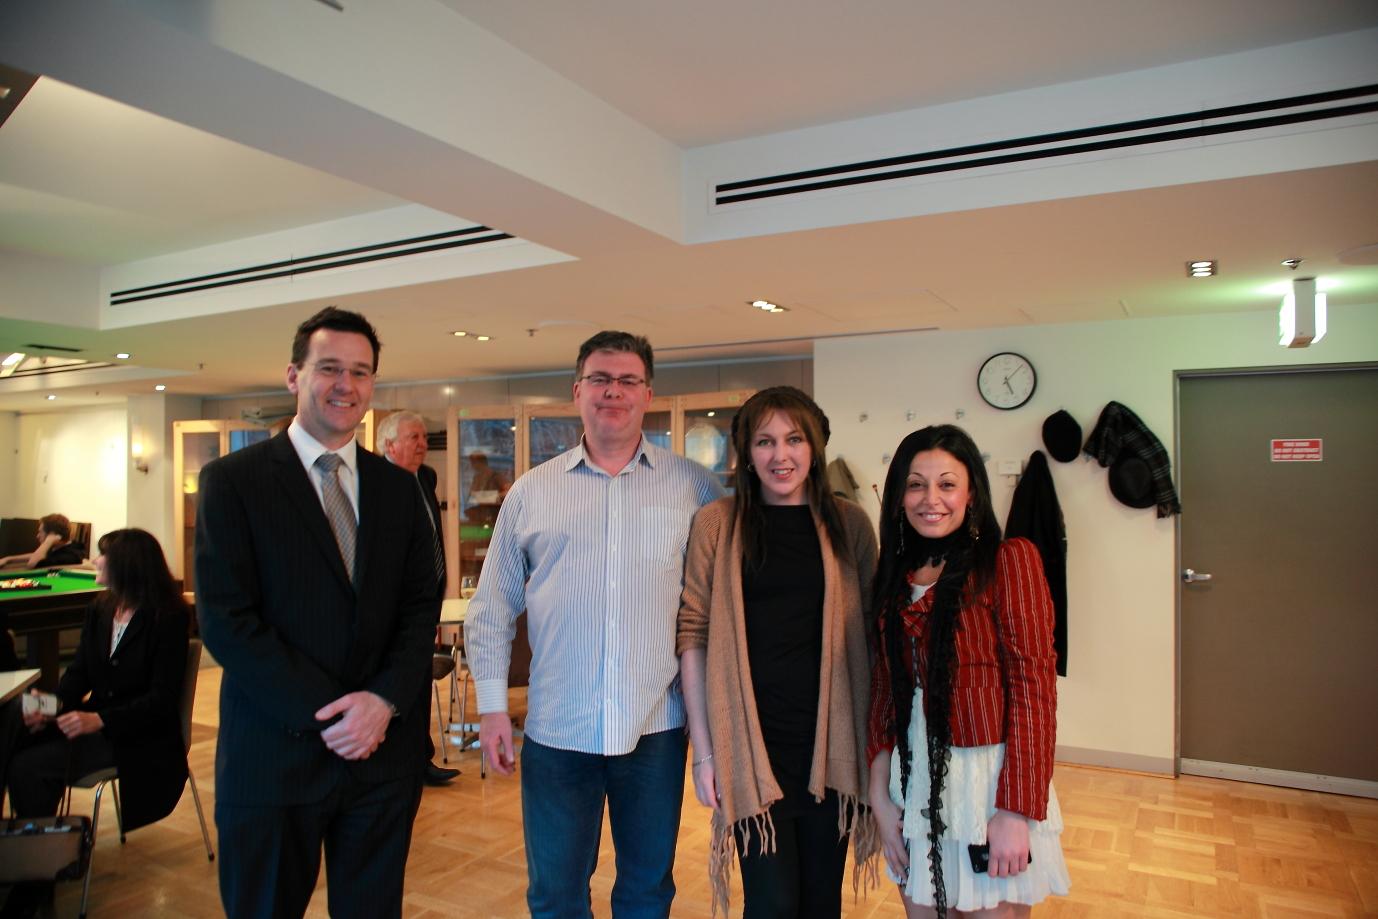 Paul Crossley; Miles O'Connor; Helen Marston of Humane Research Australia; Shatha Hamade